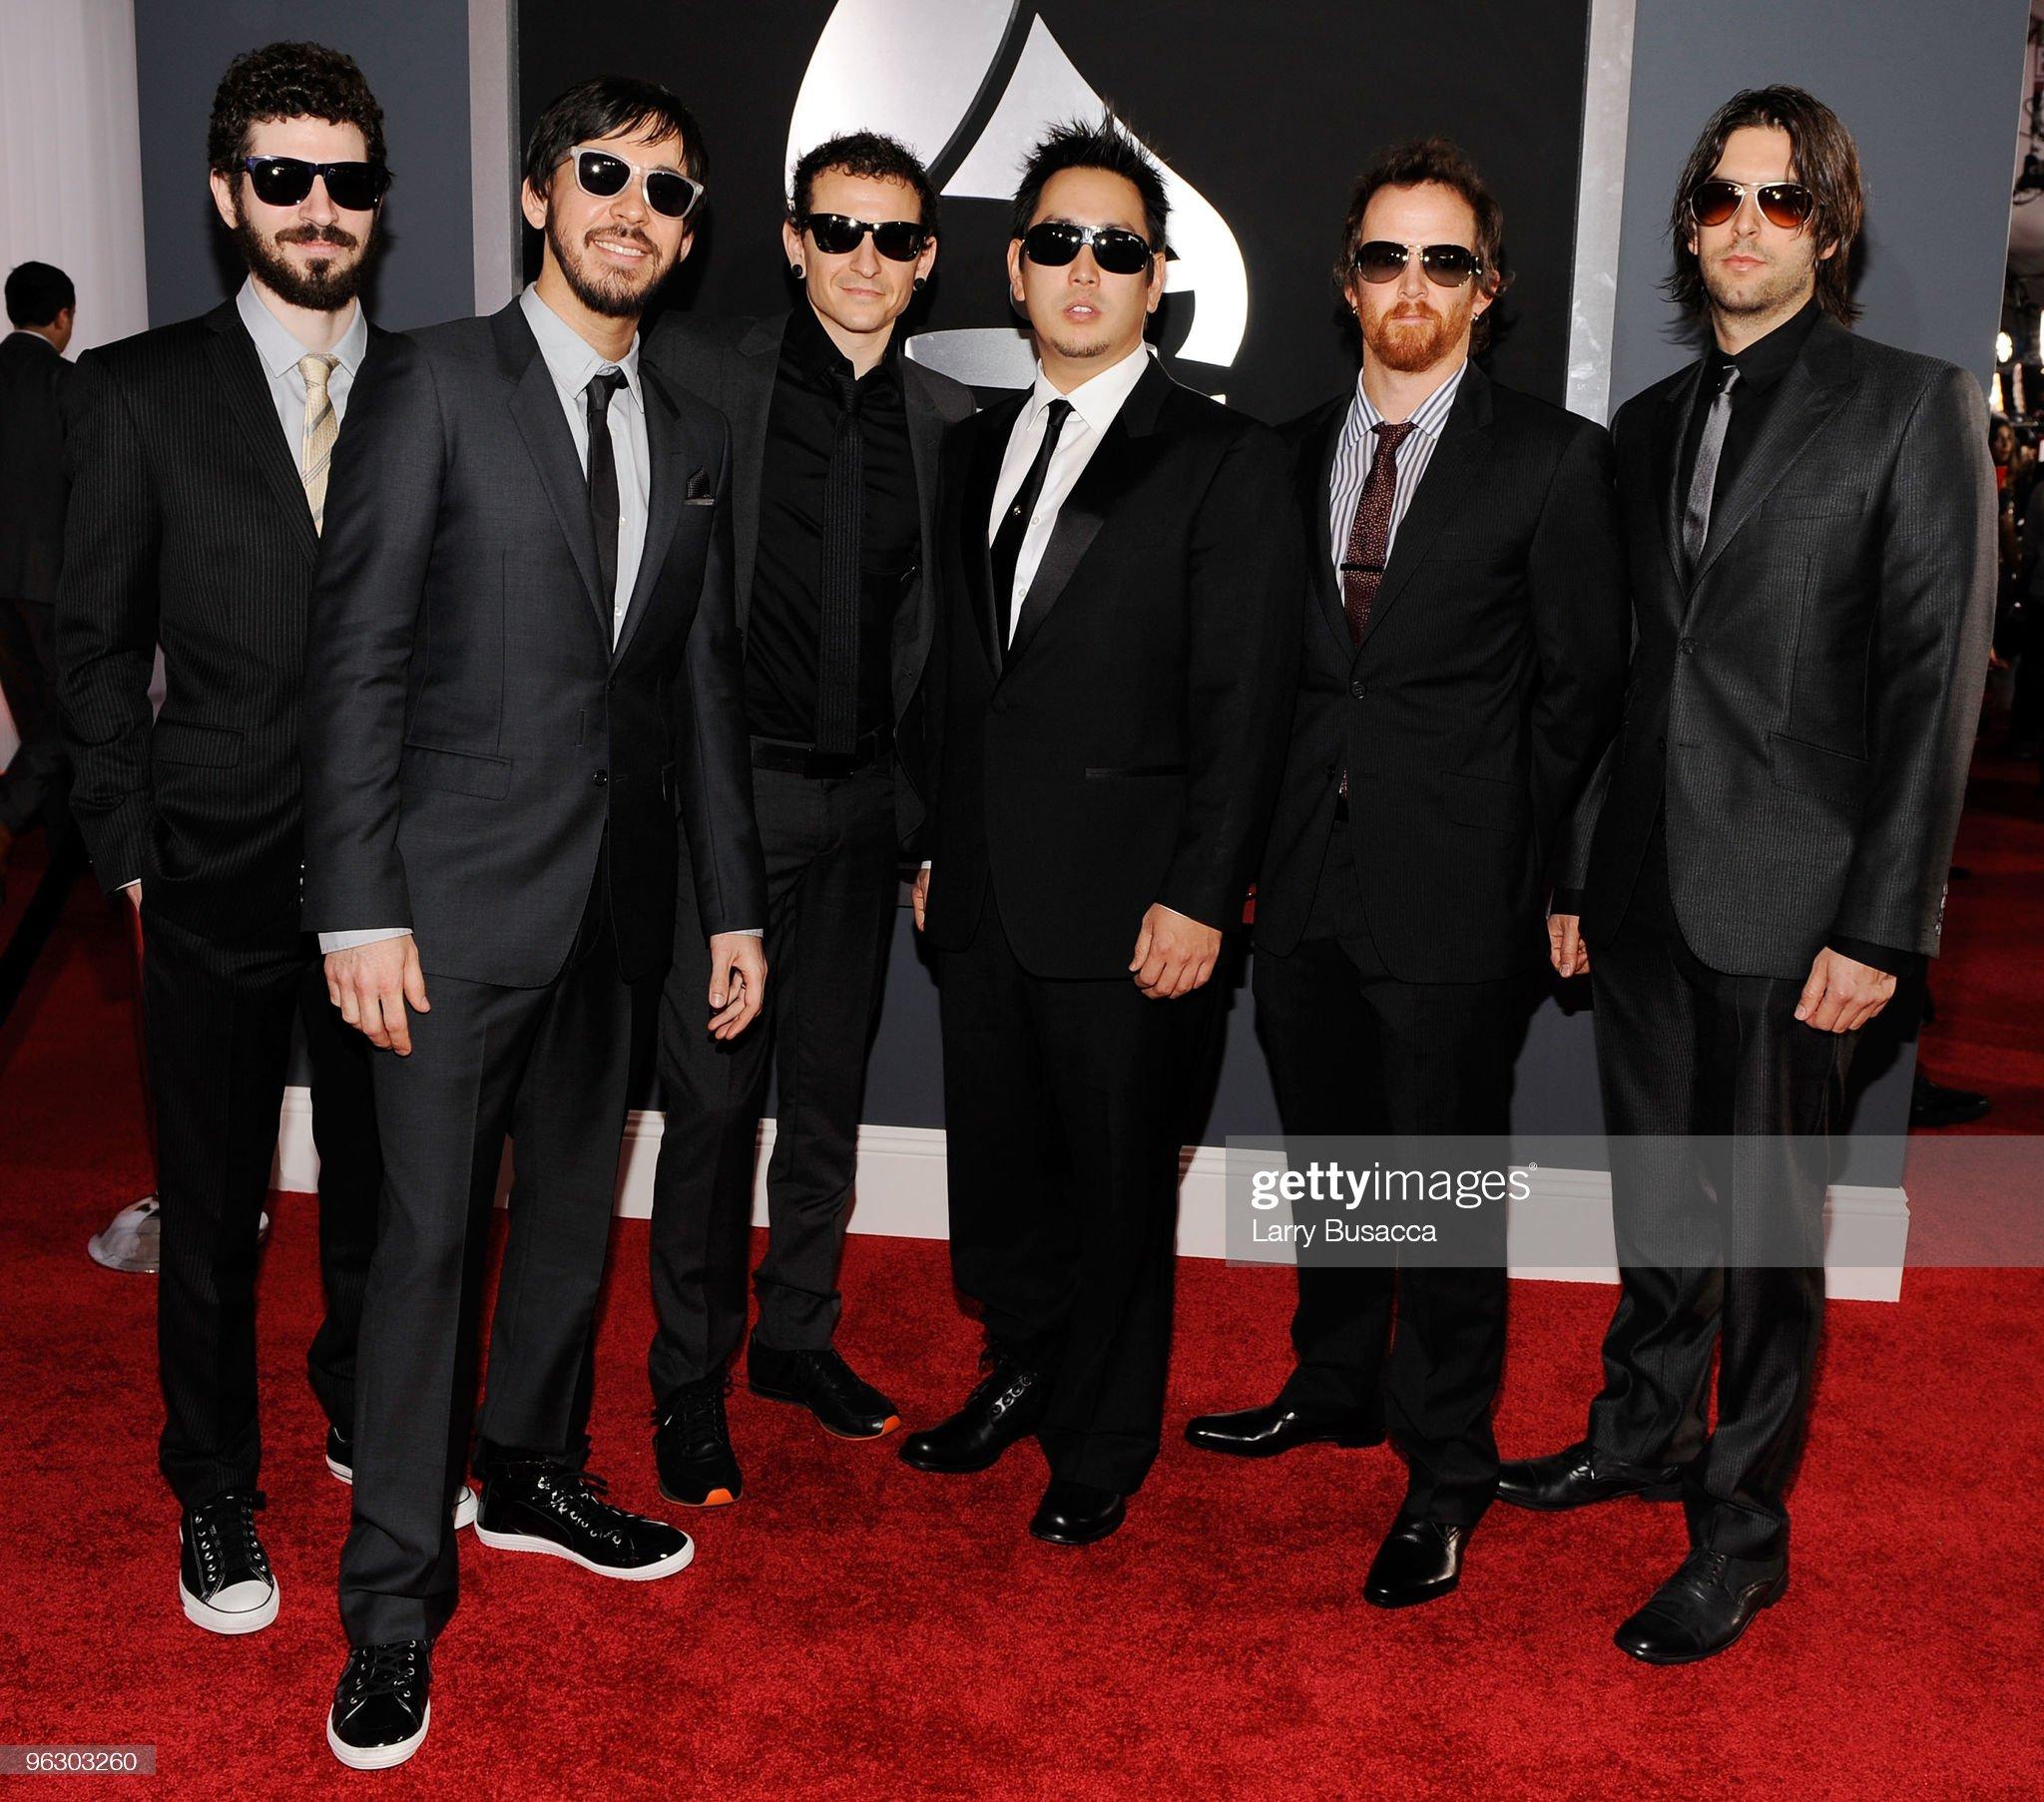 ¿Cuánto mide Chester Bennington? - Altura - Real height Musicians-brad-delson-mike-shinoda-chester-bennington-joe-hahn-david-picture-id96303260?s=2048x2048